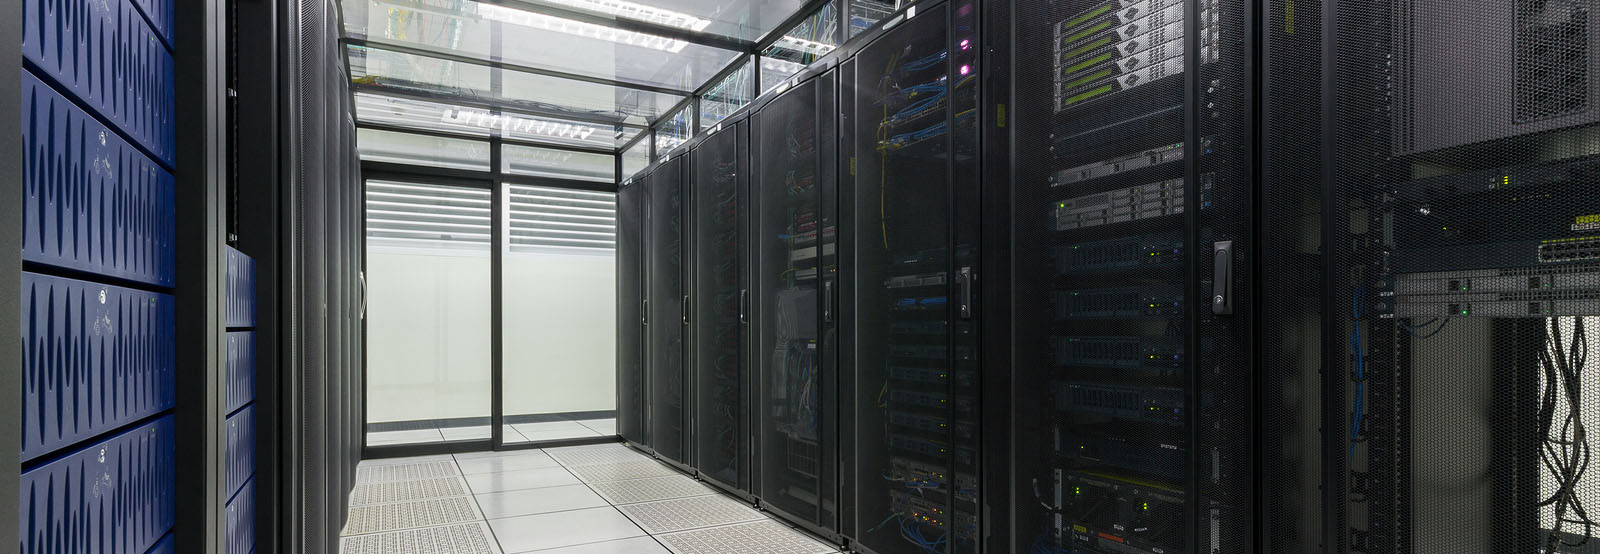 Modern interior of server room, Super Computer, Server Room, Datacenter, Data Security Center.